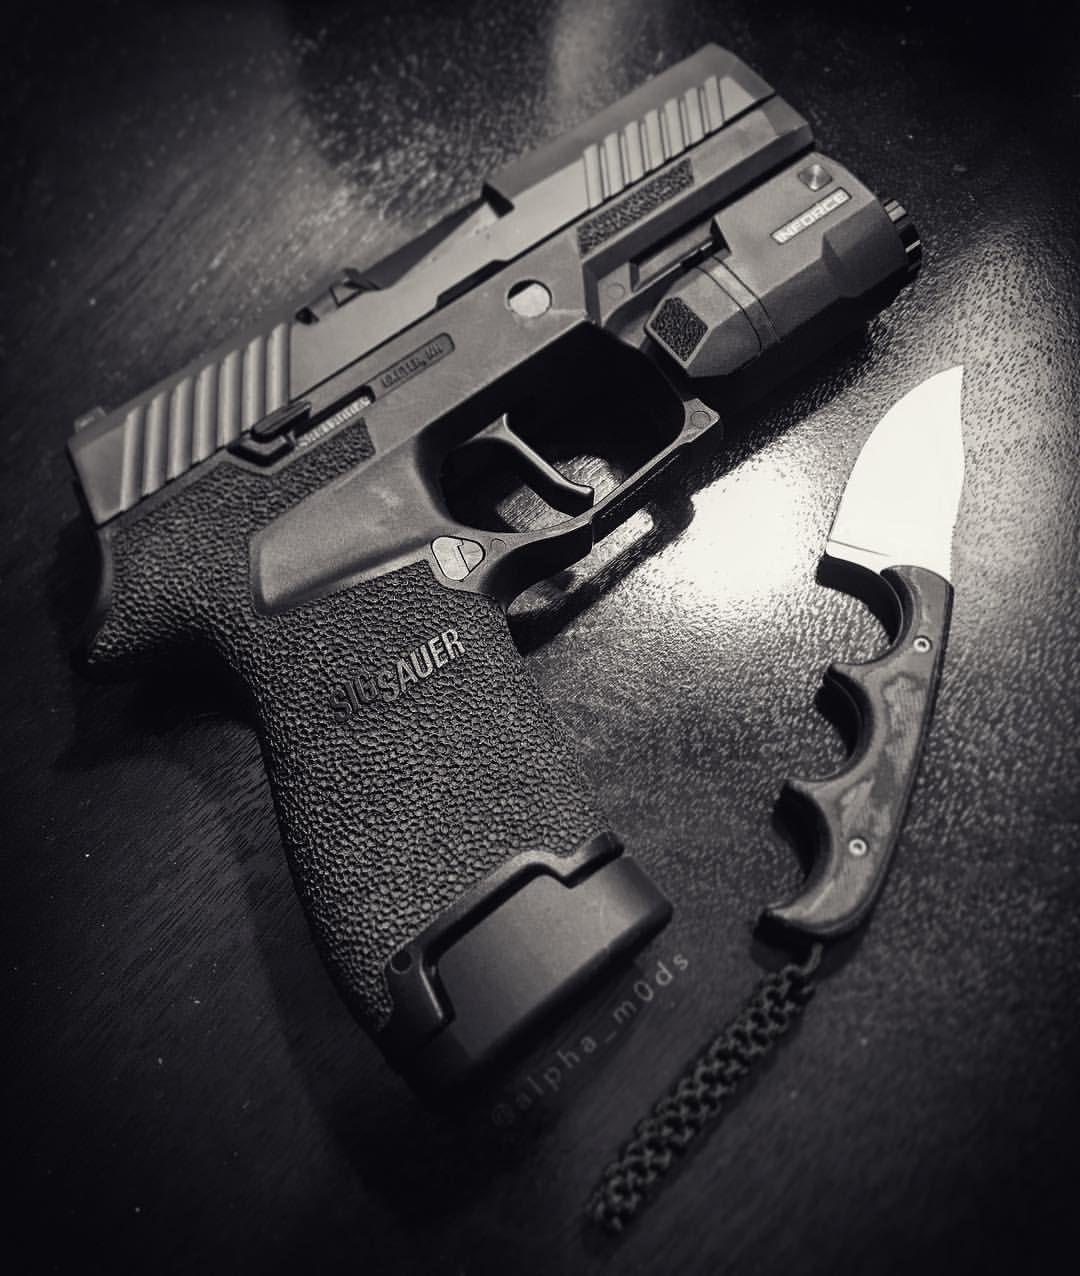 Pin by Colossus on Guns | Guns, Hand guns, Sig p320